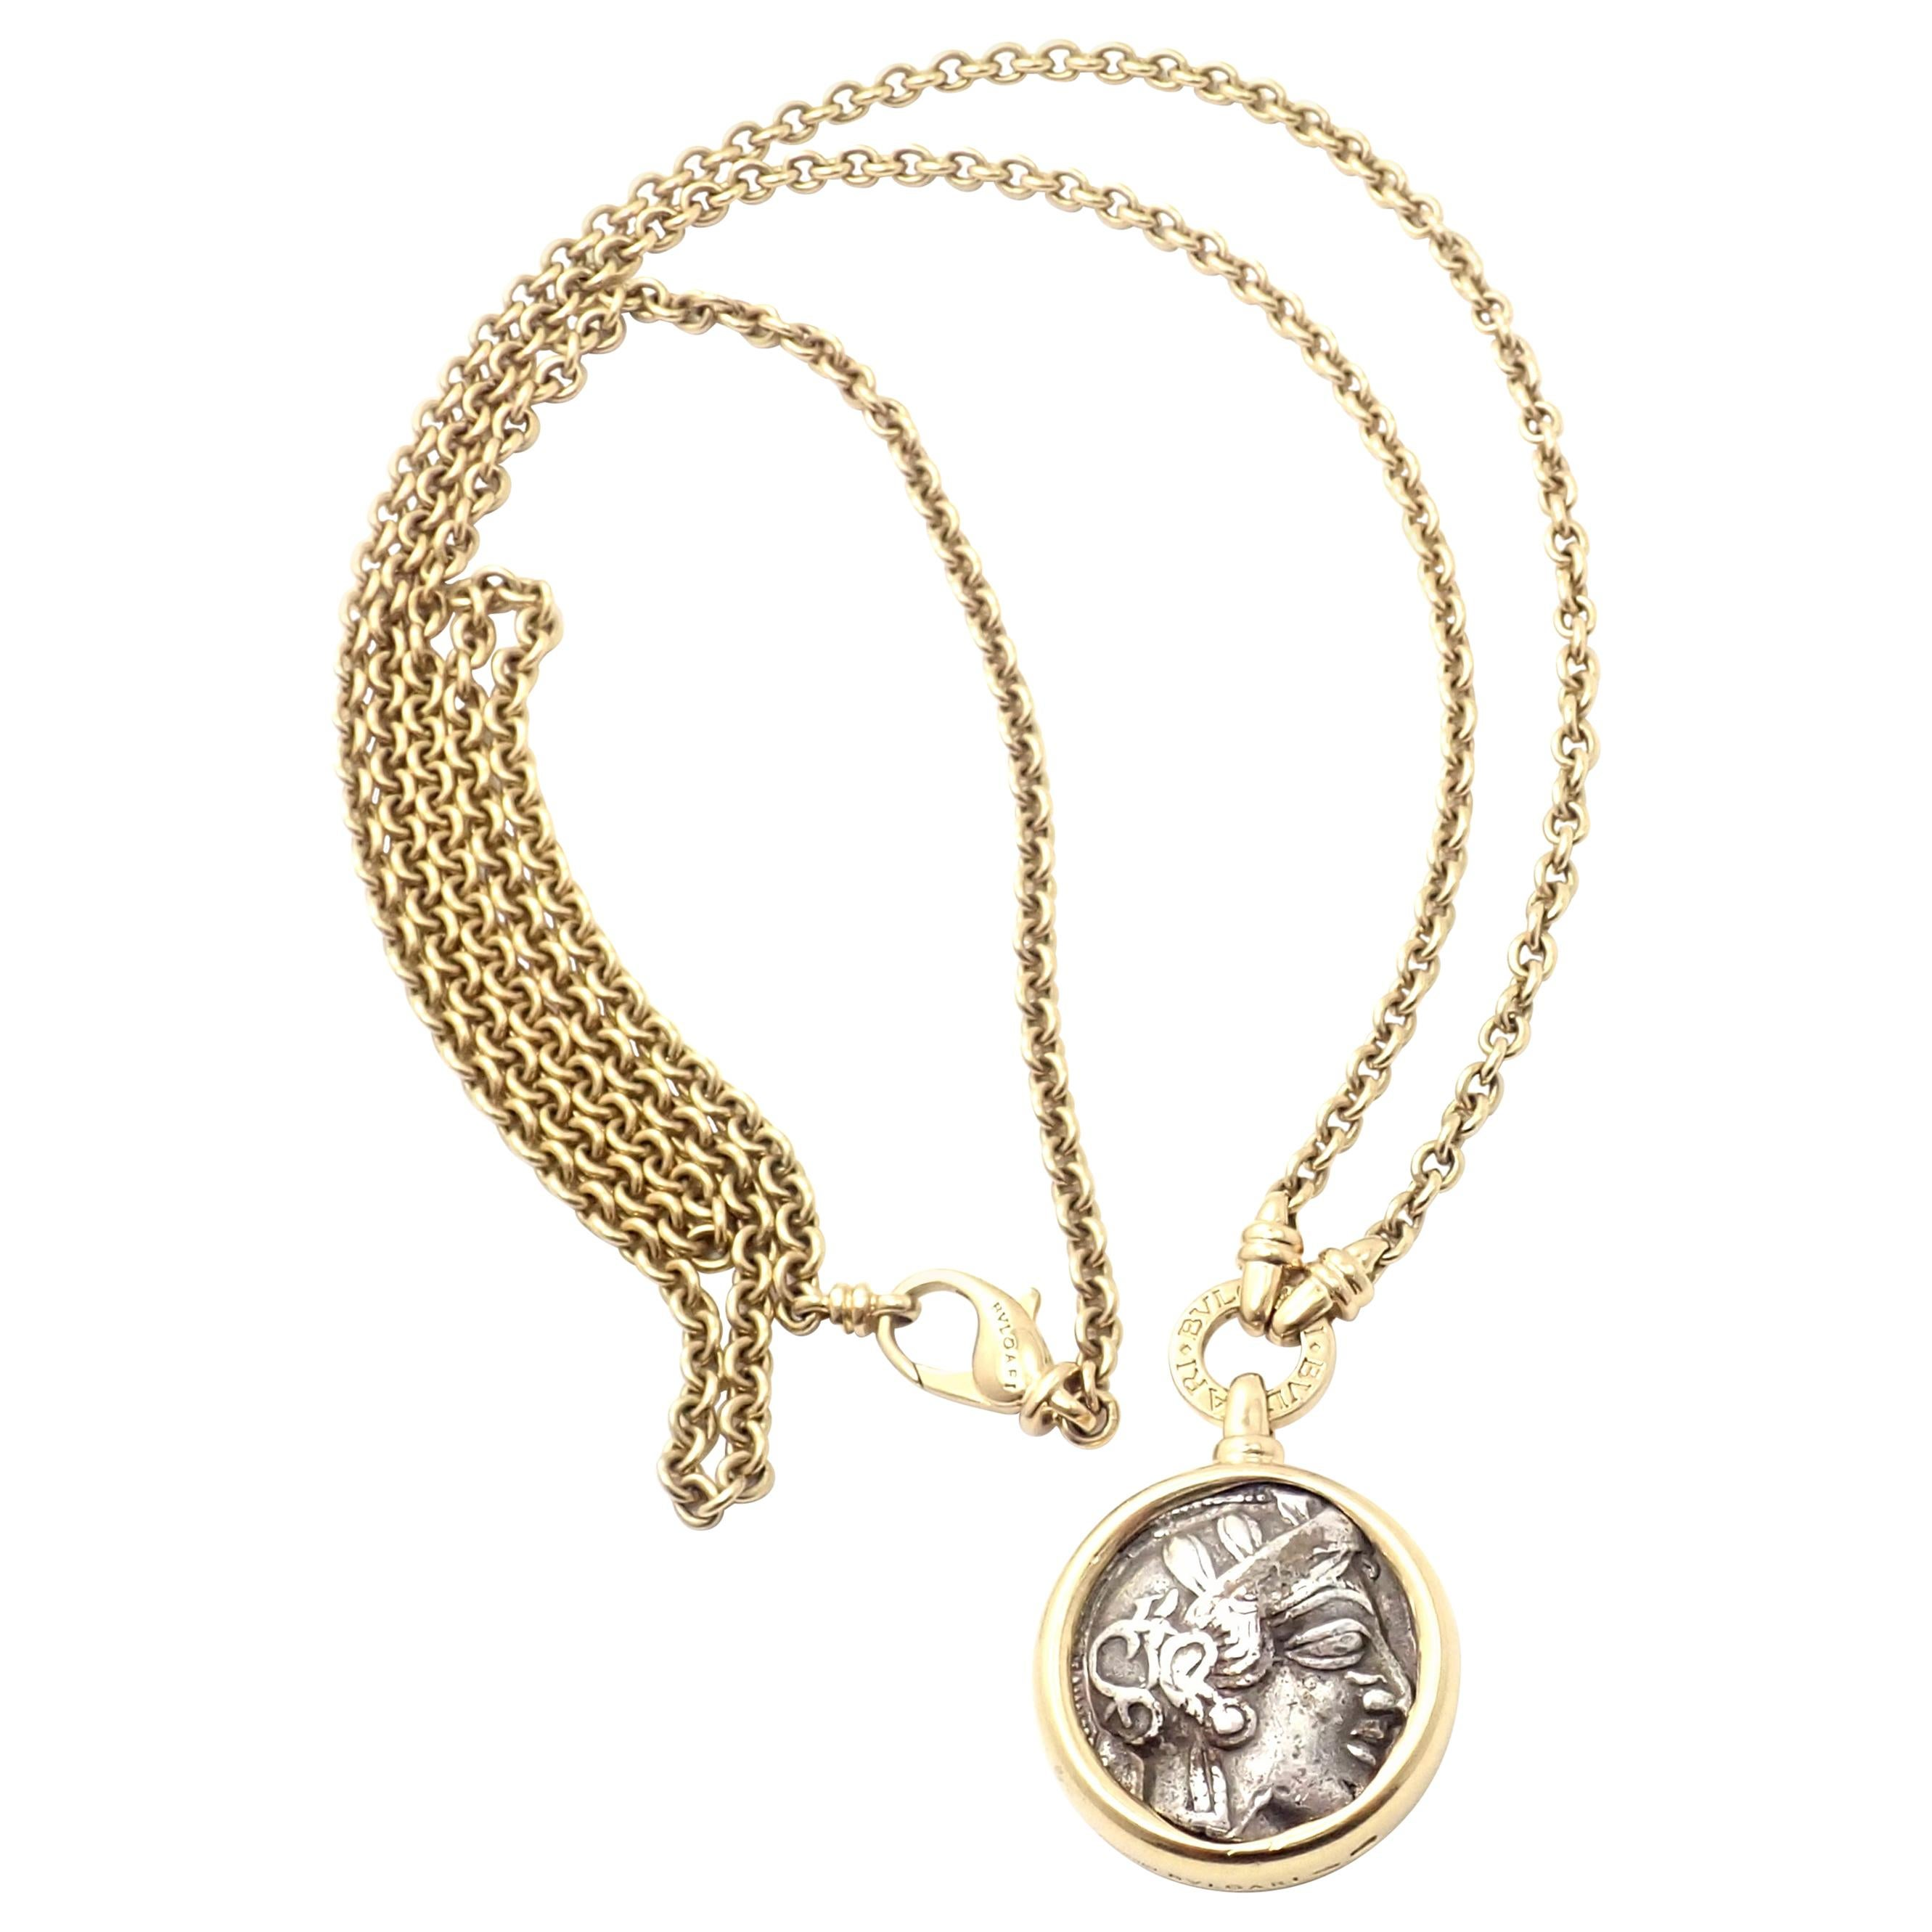 Bvlgari Bulgari Ancient Greek Coin Long Yellow Gold Link Chain Necklace